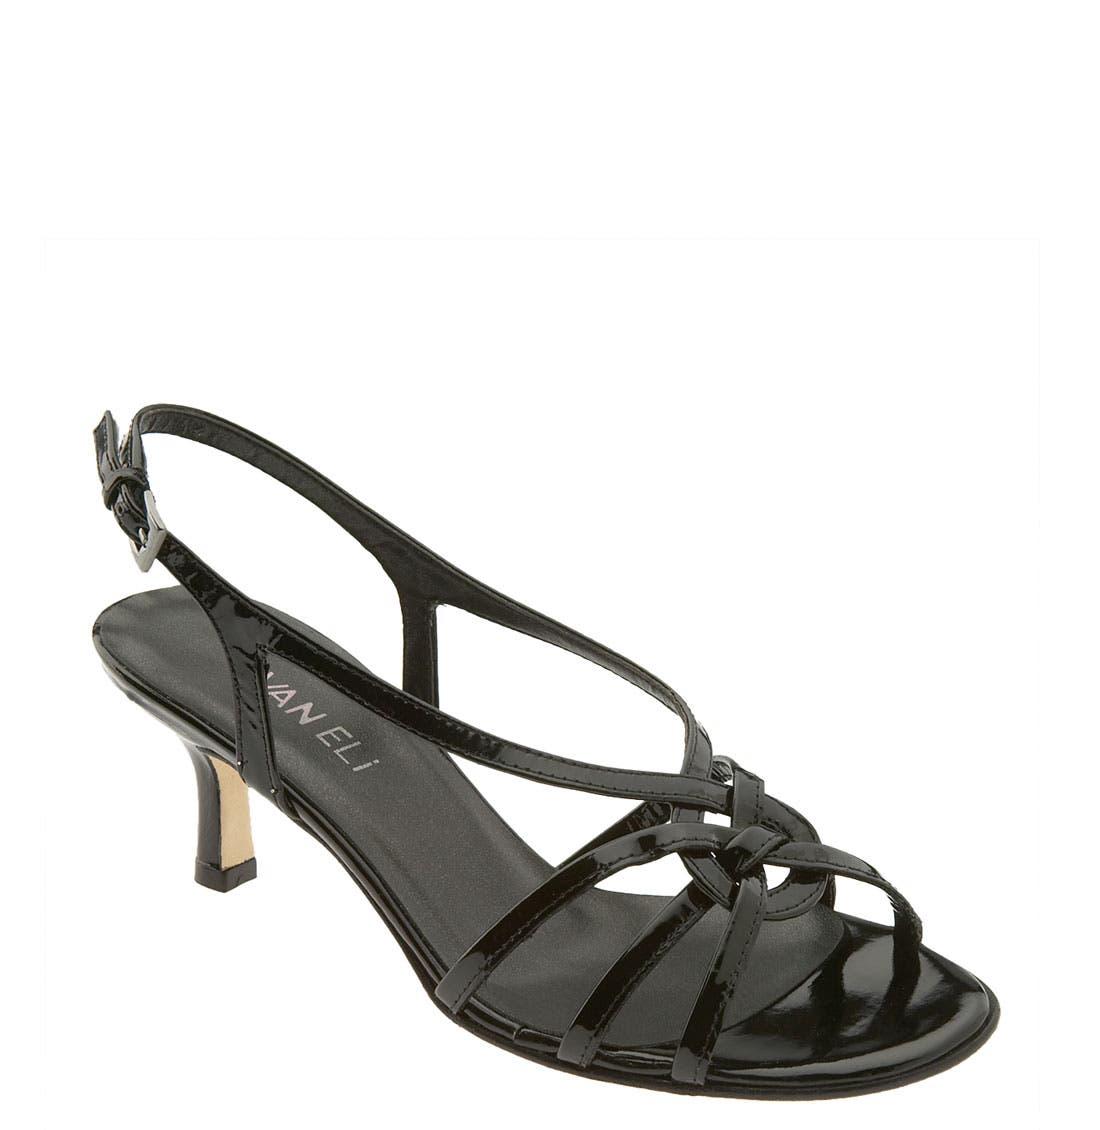 Main Image - VANELi 'Modesta' Sandal